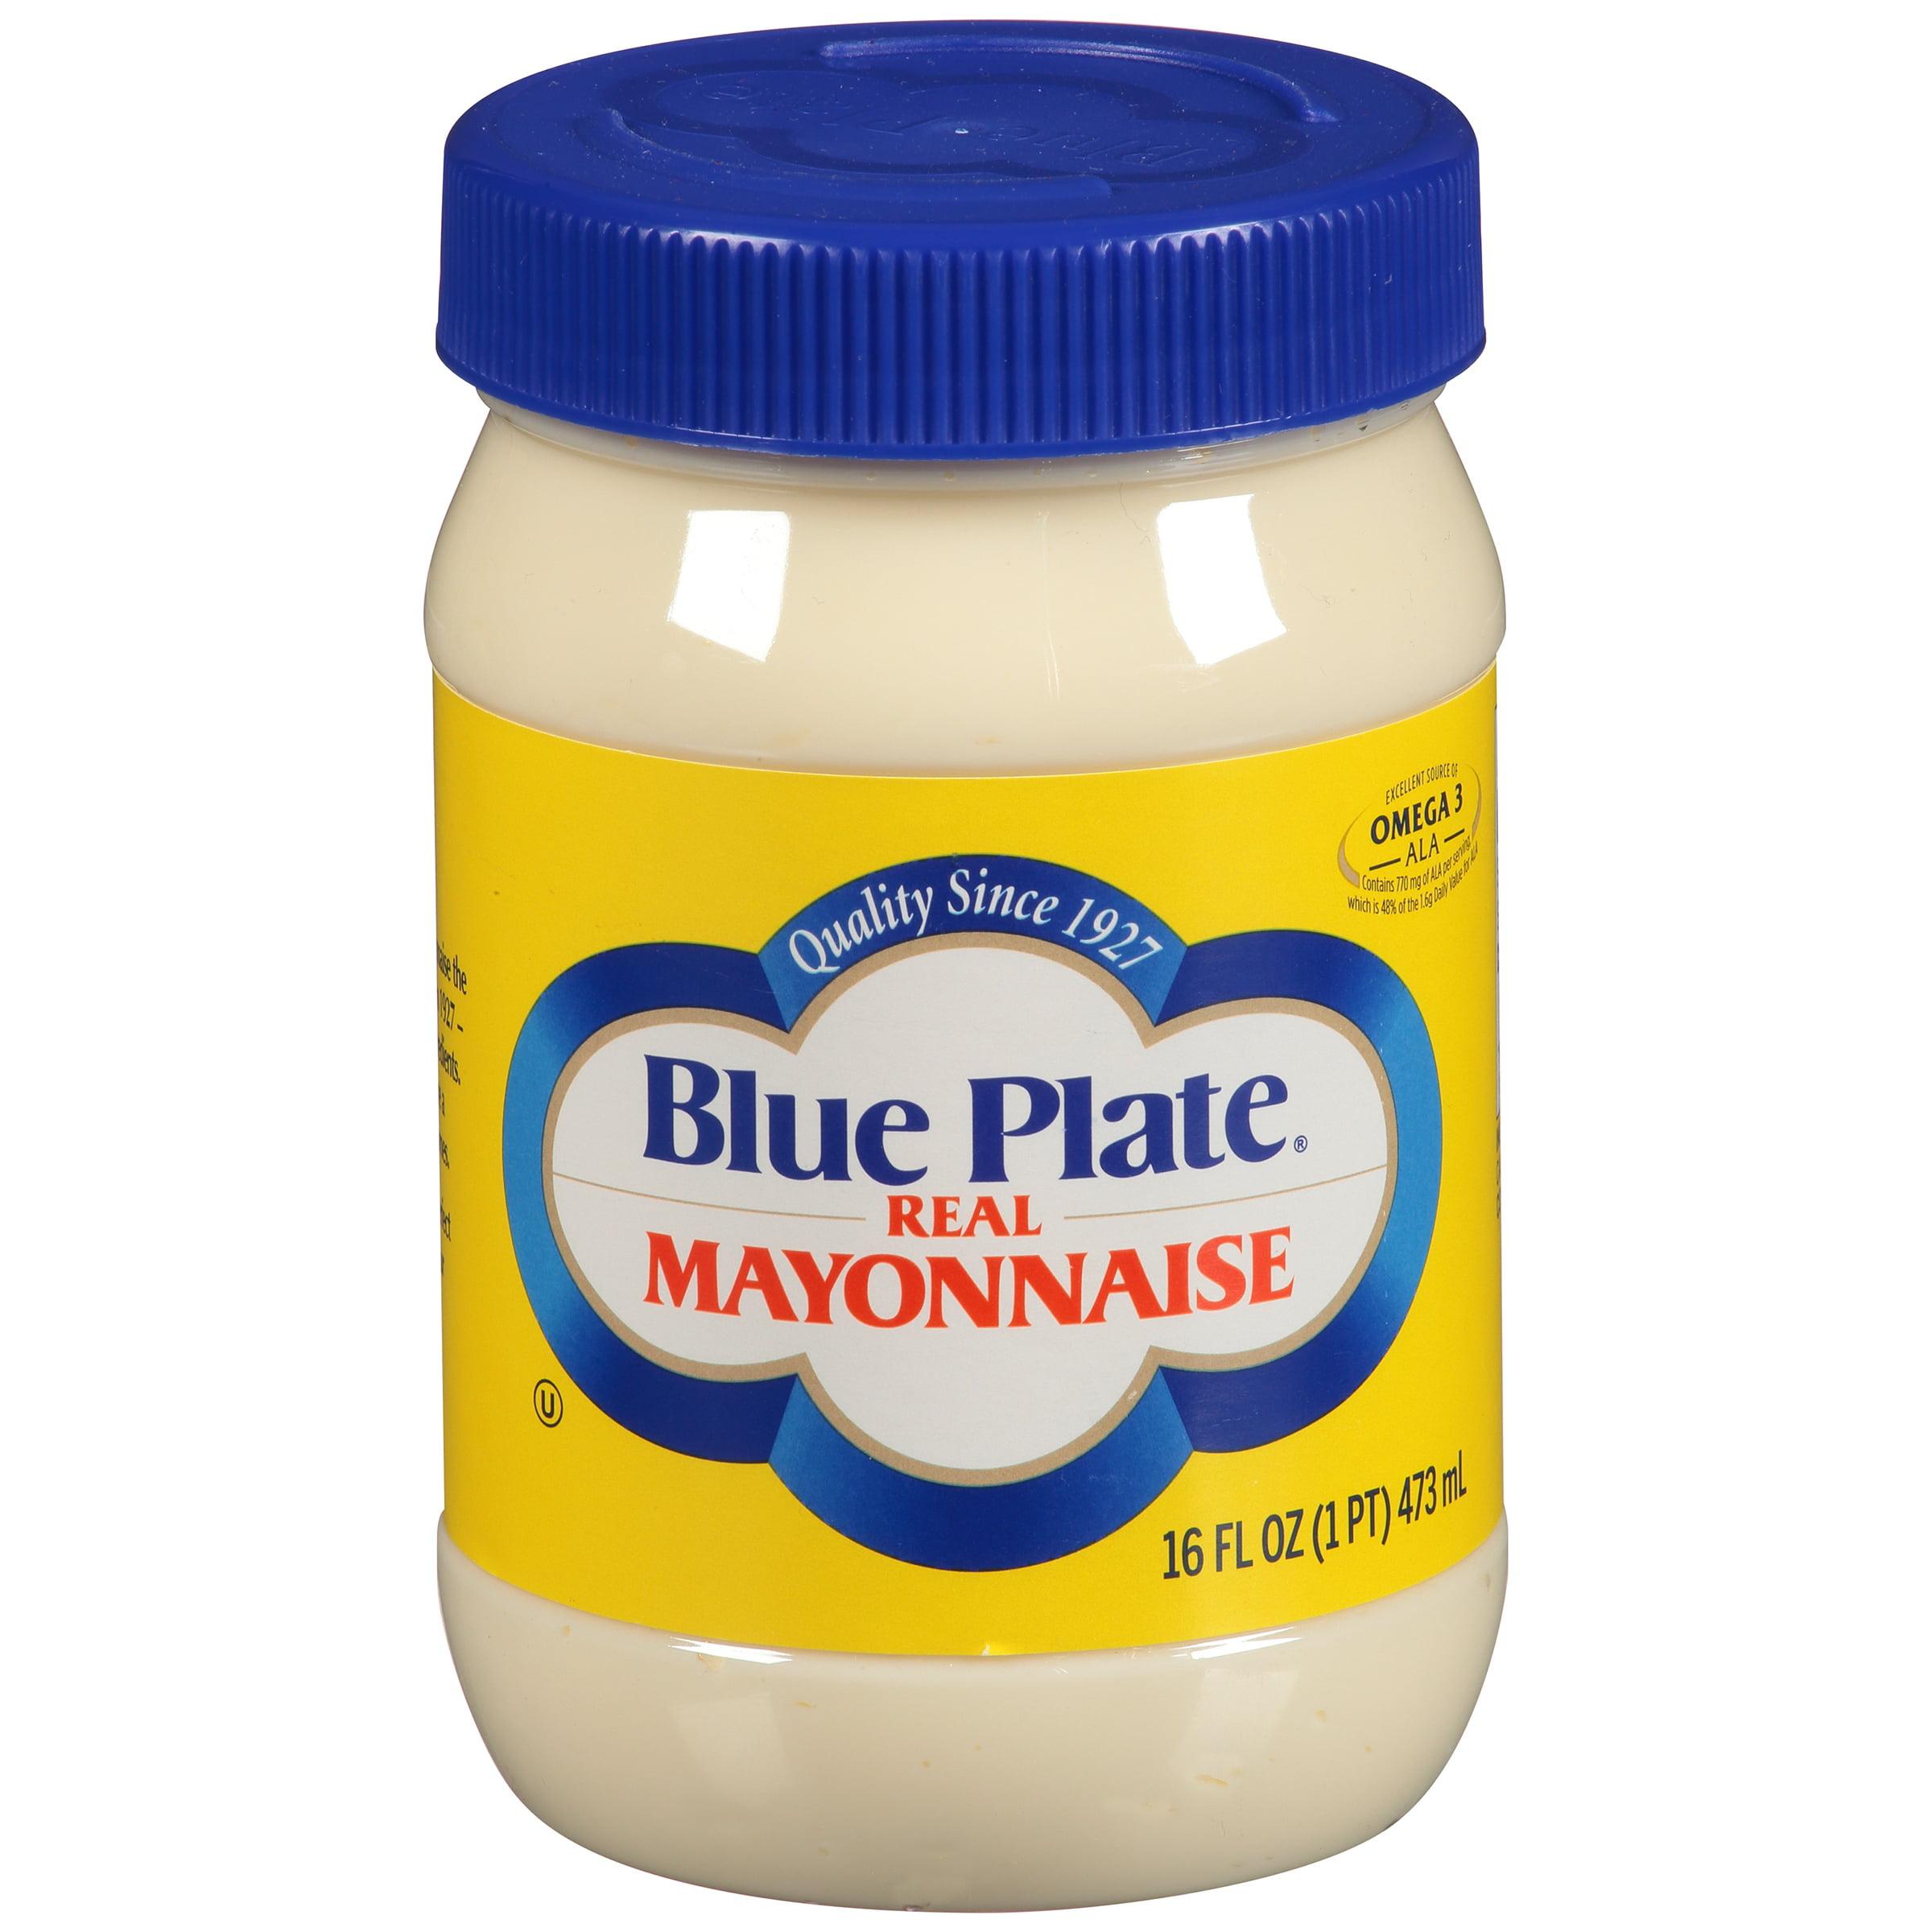 Blue Plate Real Mayonnaise, 16 fl oz - Walmart.com